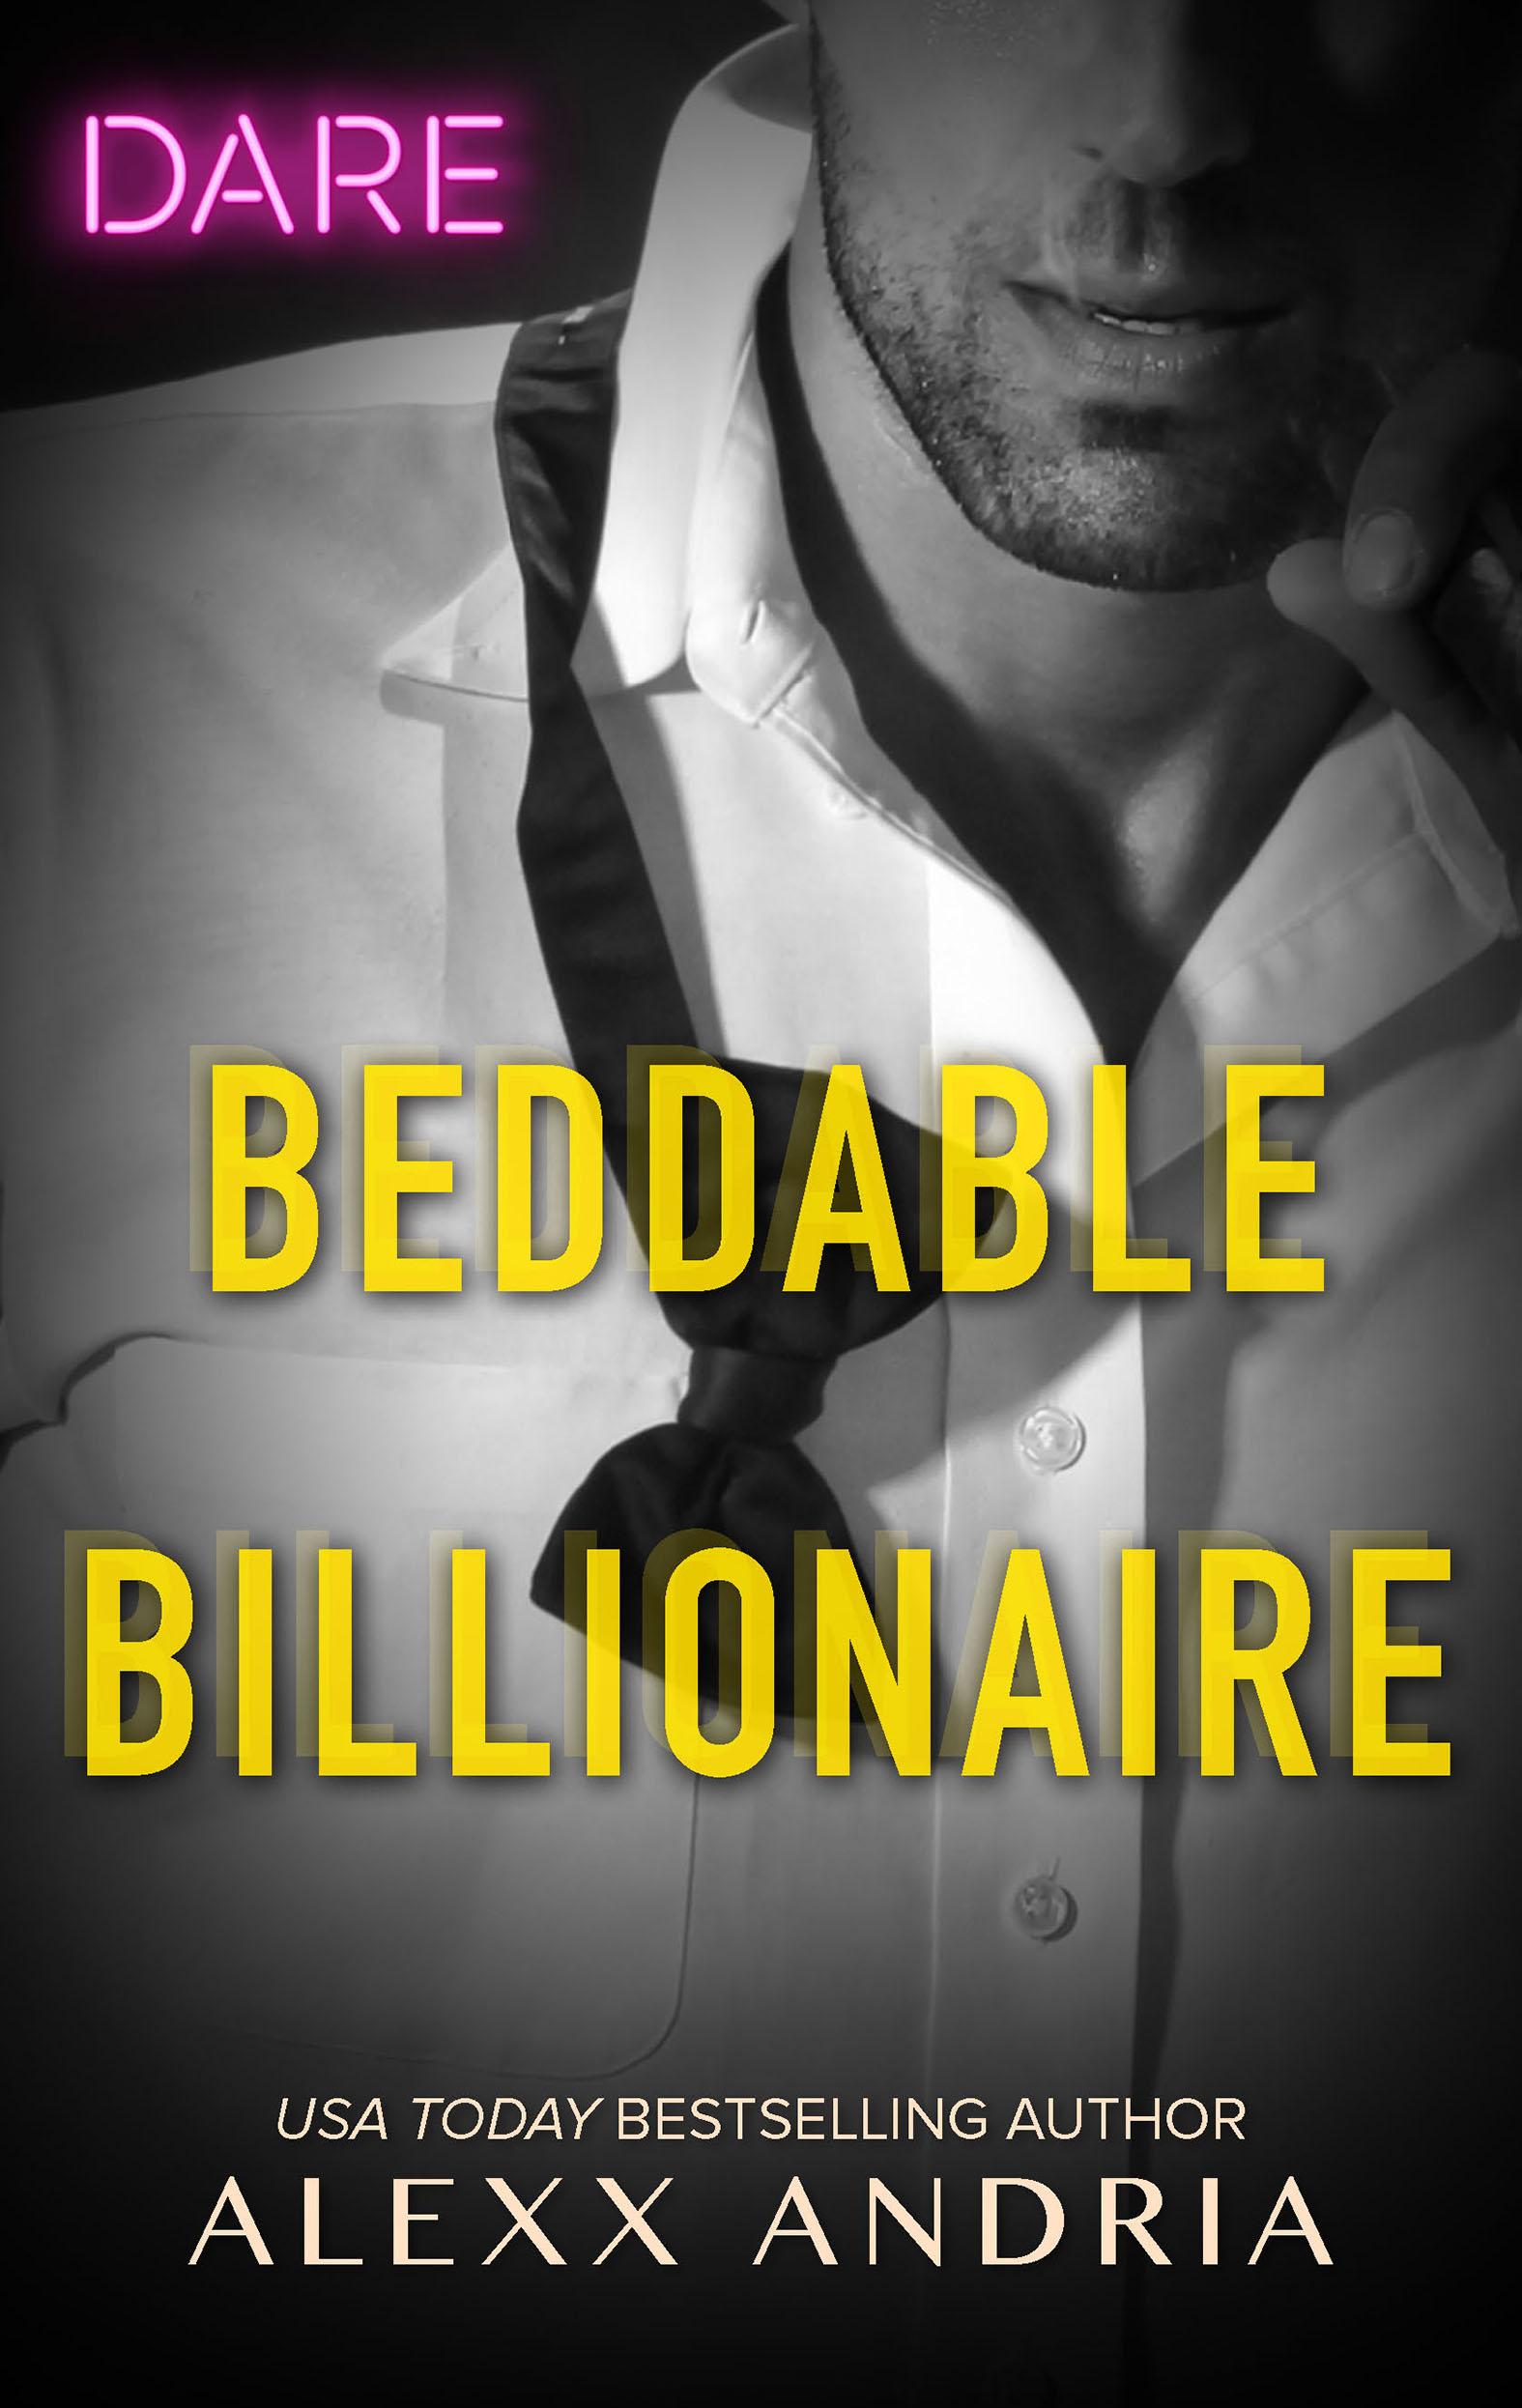 Beddable Billionaire A Sexy Billionaire Romance